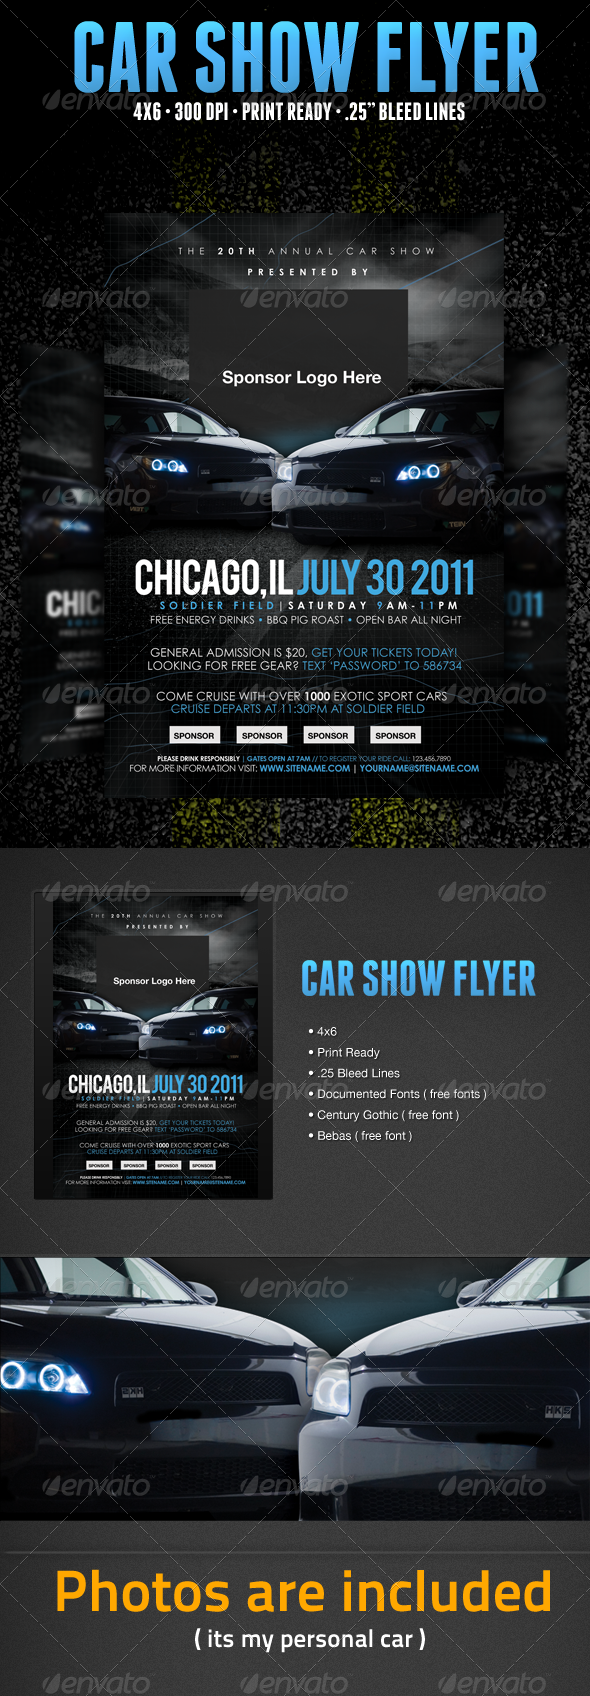 GraphicRiver Car Show Flyer Template 336254